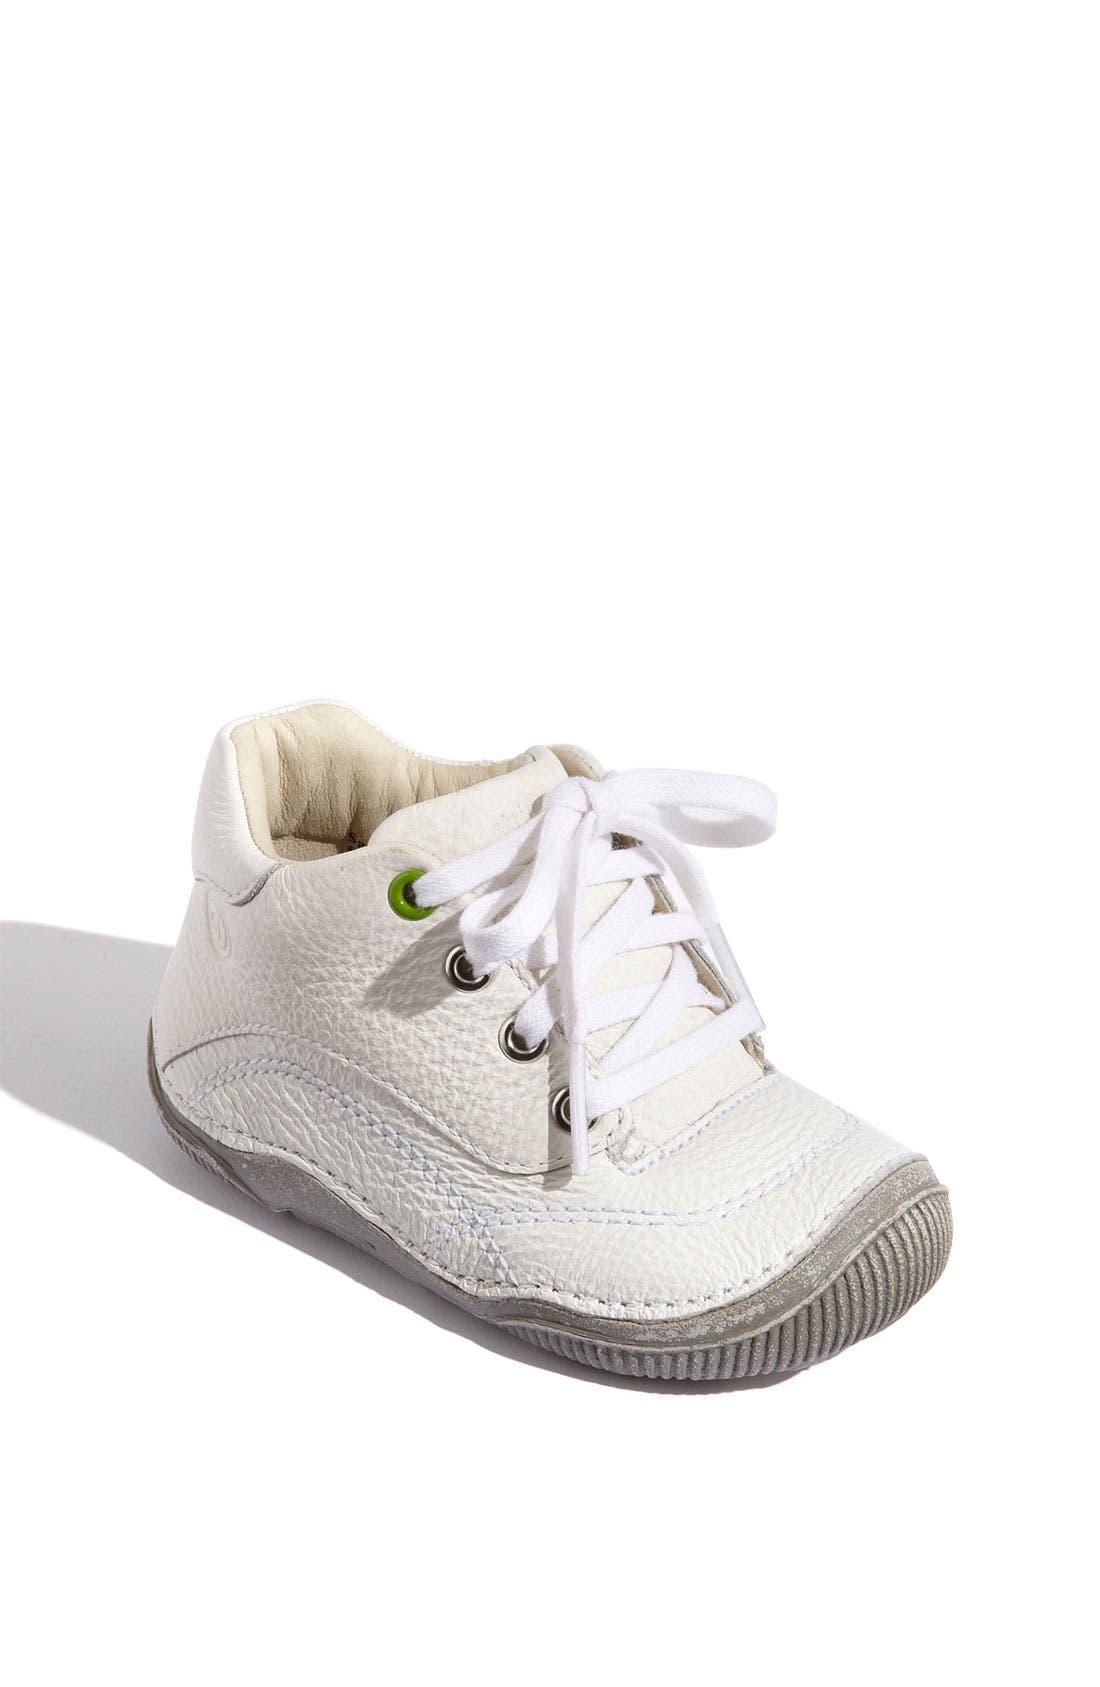 Alternate Image 1 Selected - Stride Rite 'Brattle' Sneaker (Baby, Walker & Toddler)